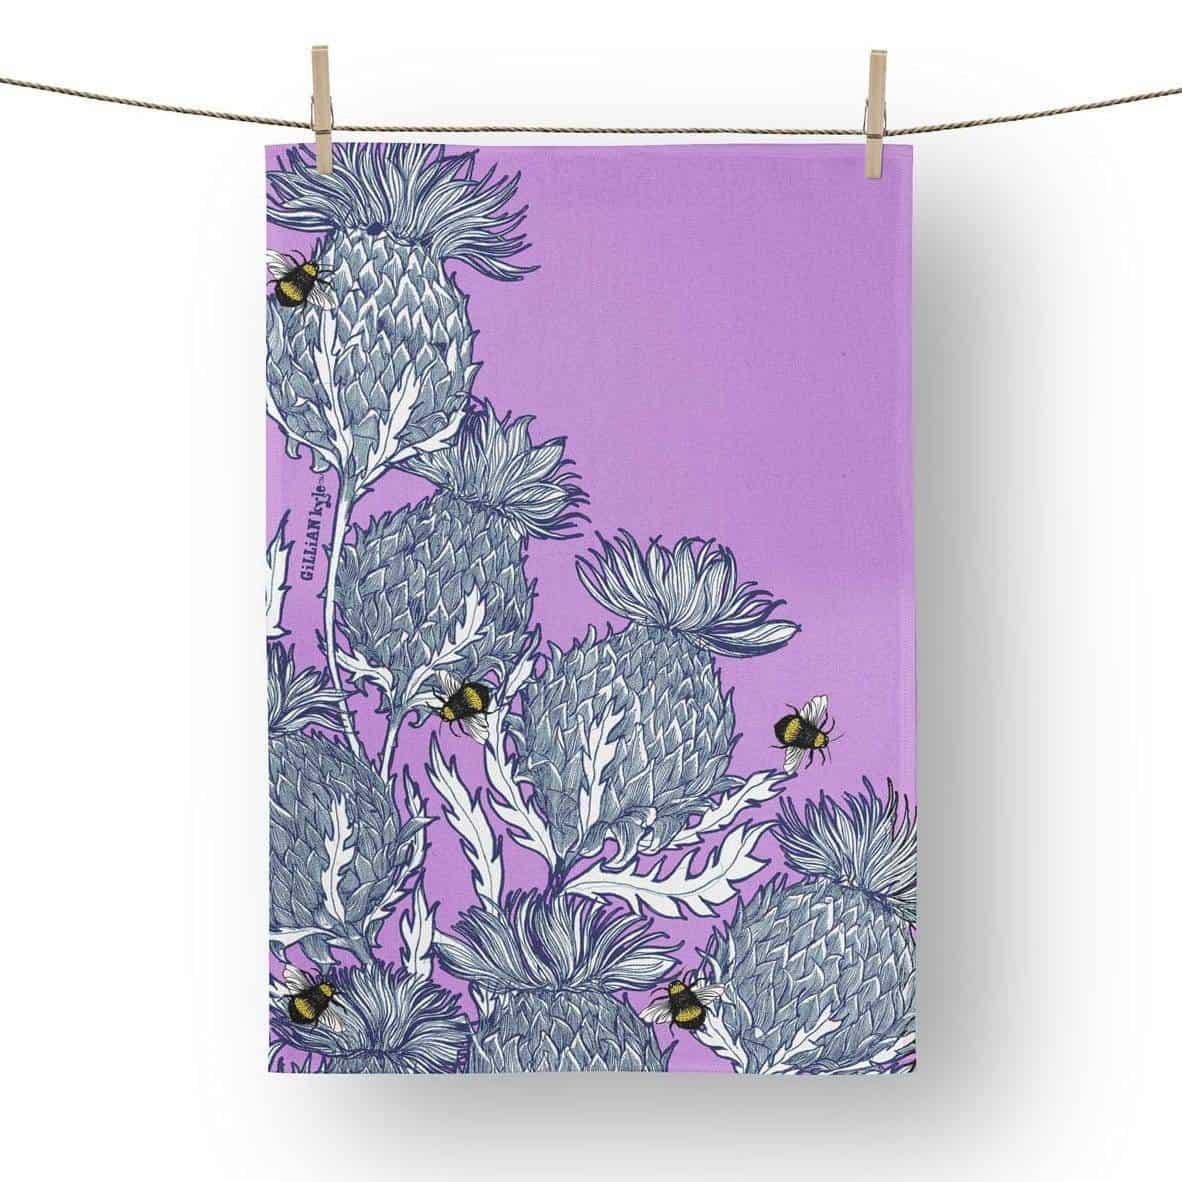 Flower of Scotland, Scottish Thistle tea towels by Scottish artist Gillian Kyle